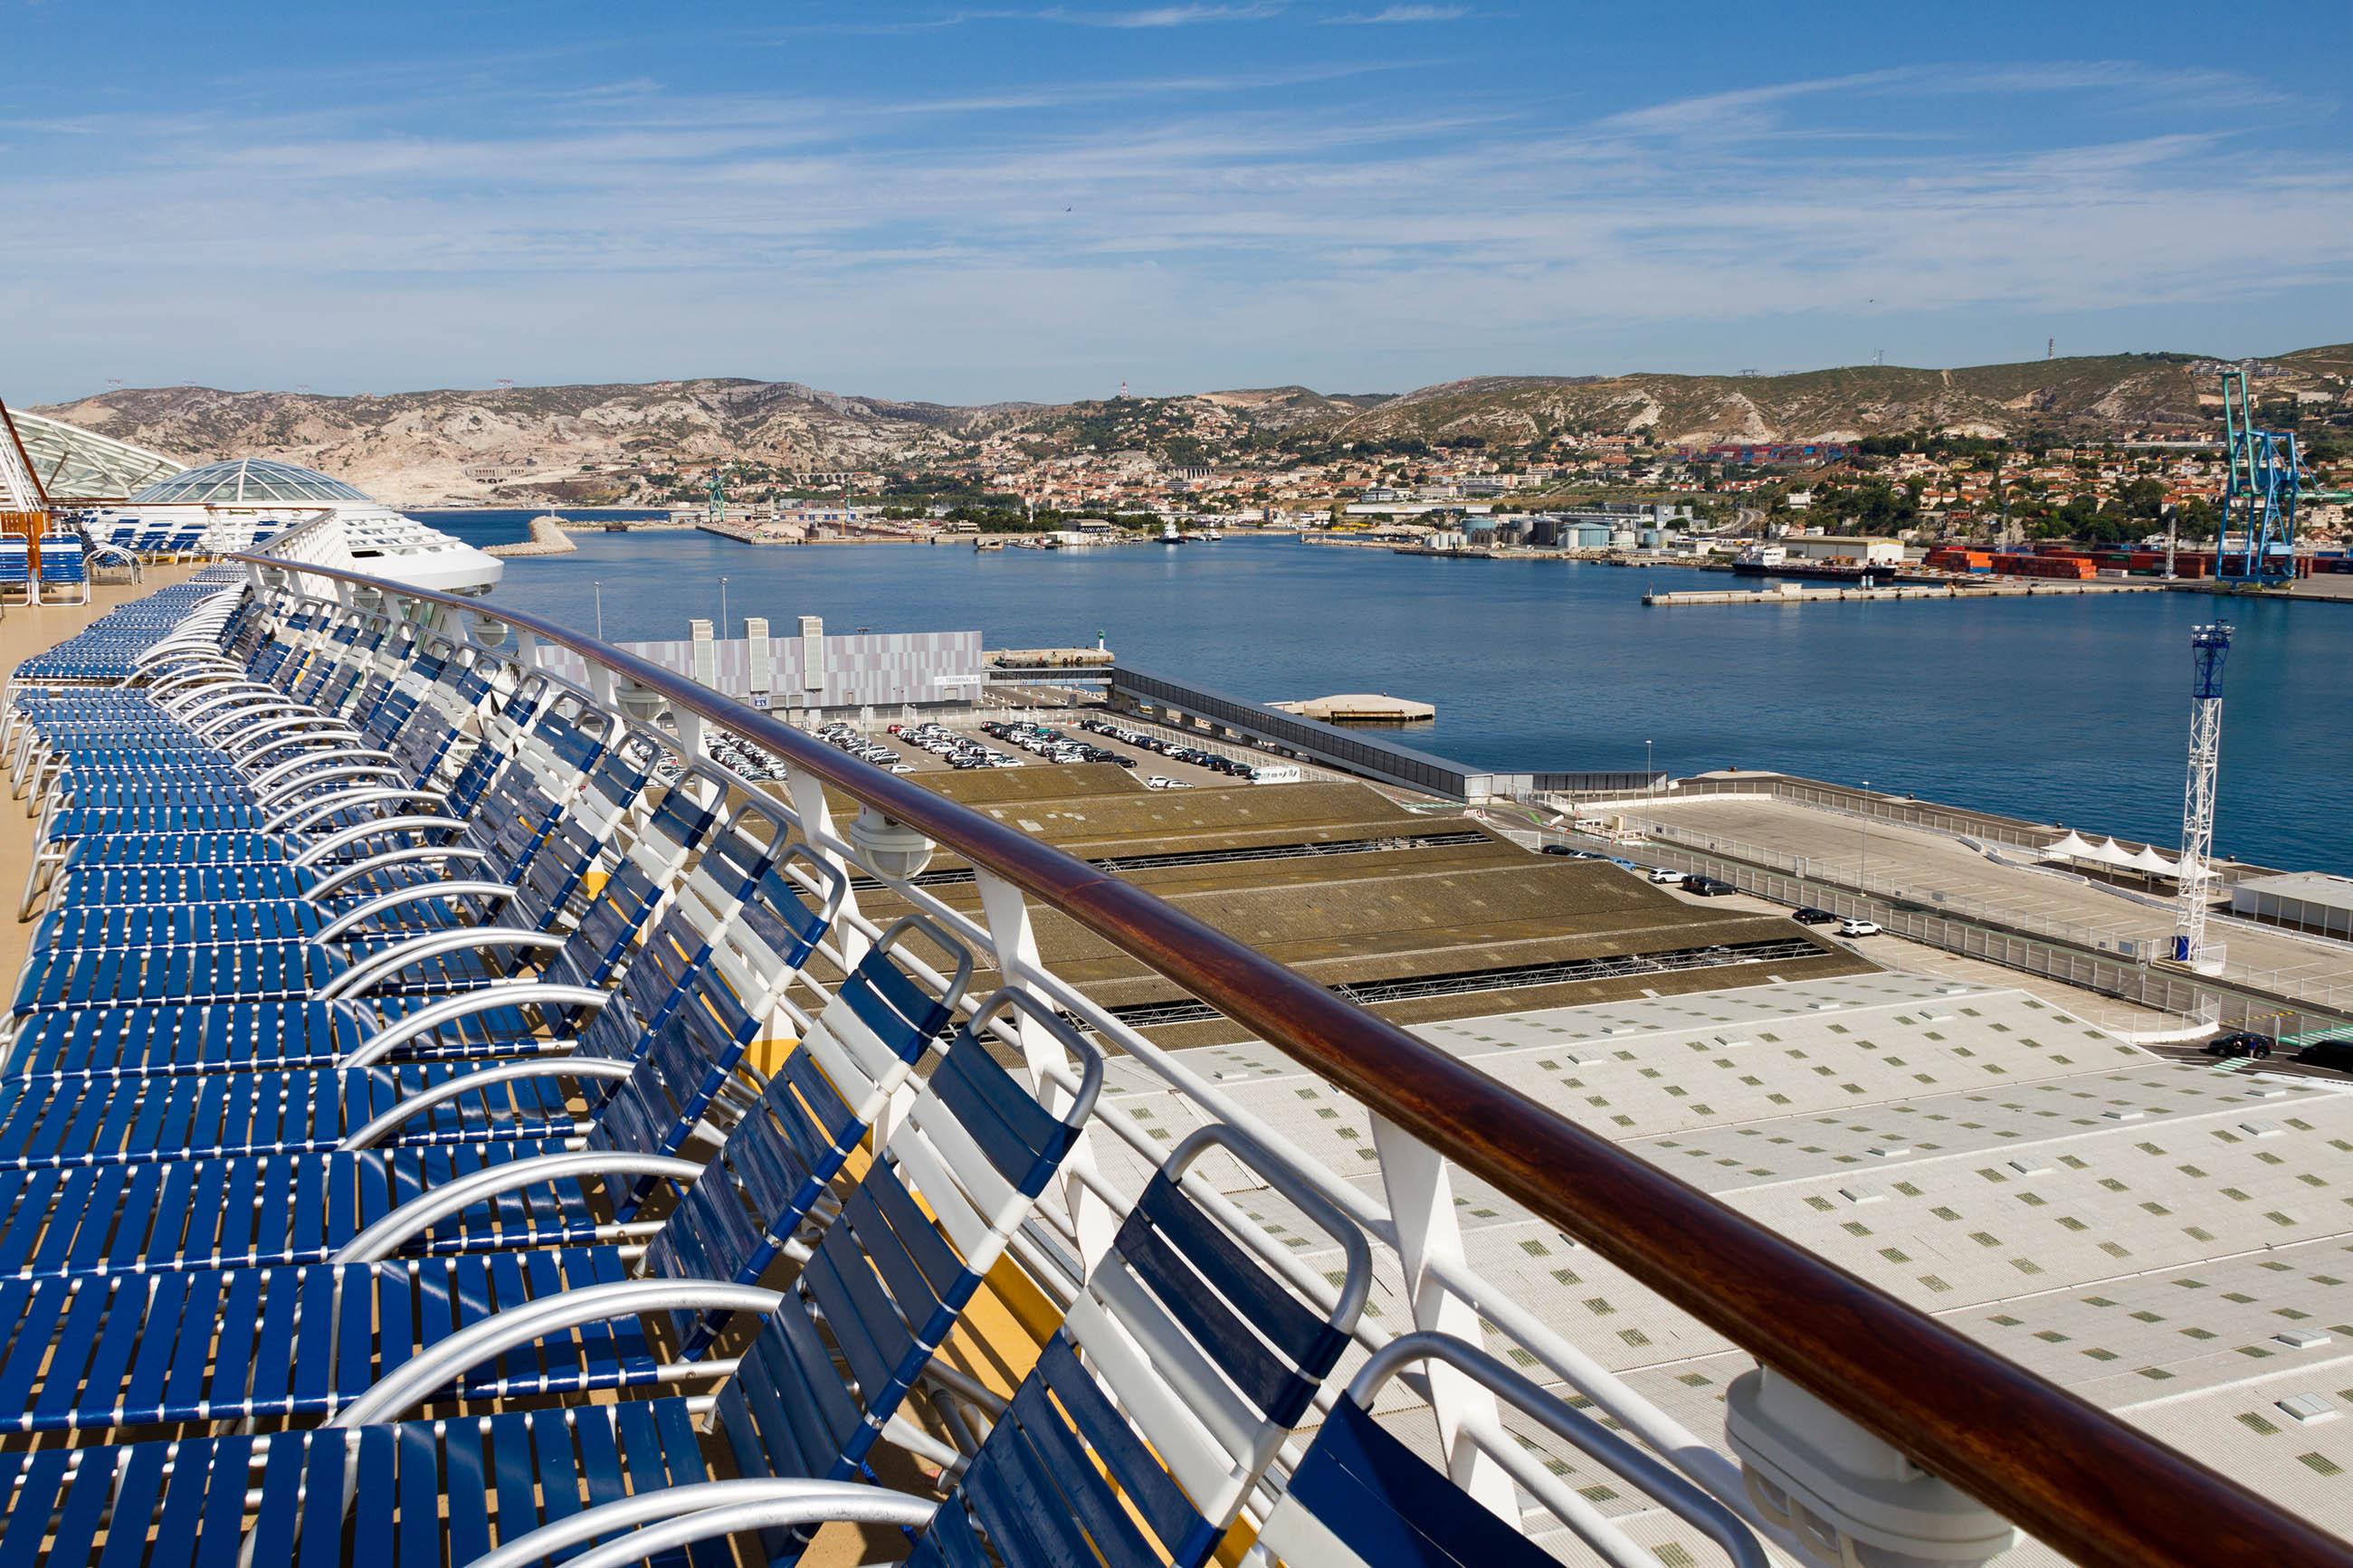 Cruise Ship Docked, Blue, Sea, View, Vessel, HQ Photo